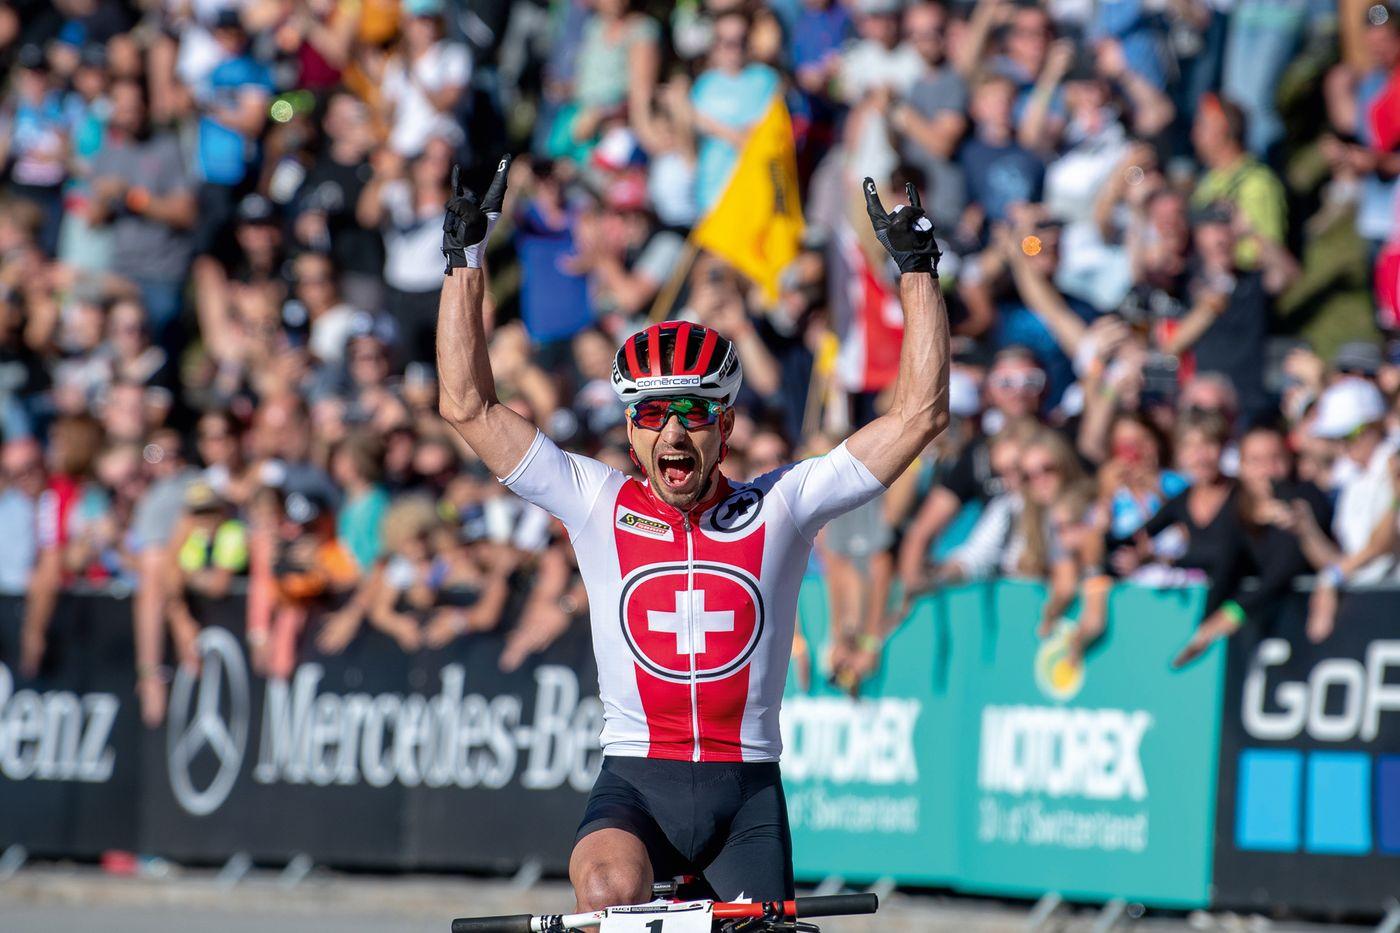 Nino Schurter - UCI MTB Worlds Championship Lenzerheide 2018